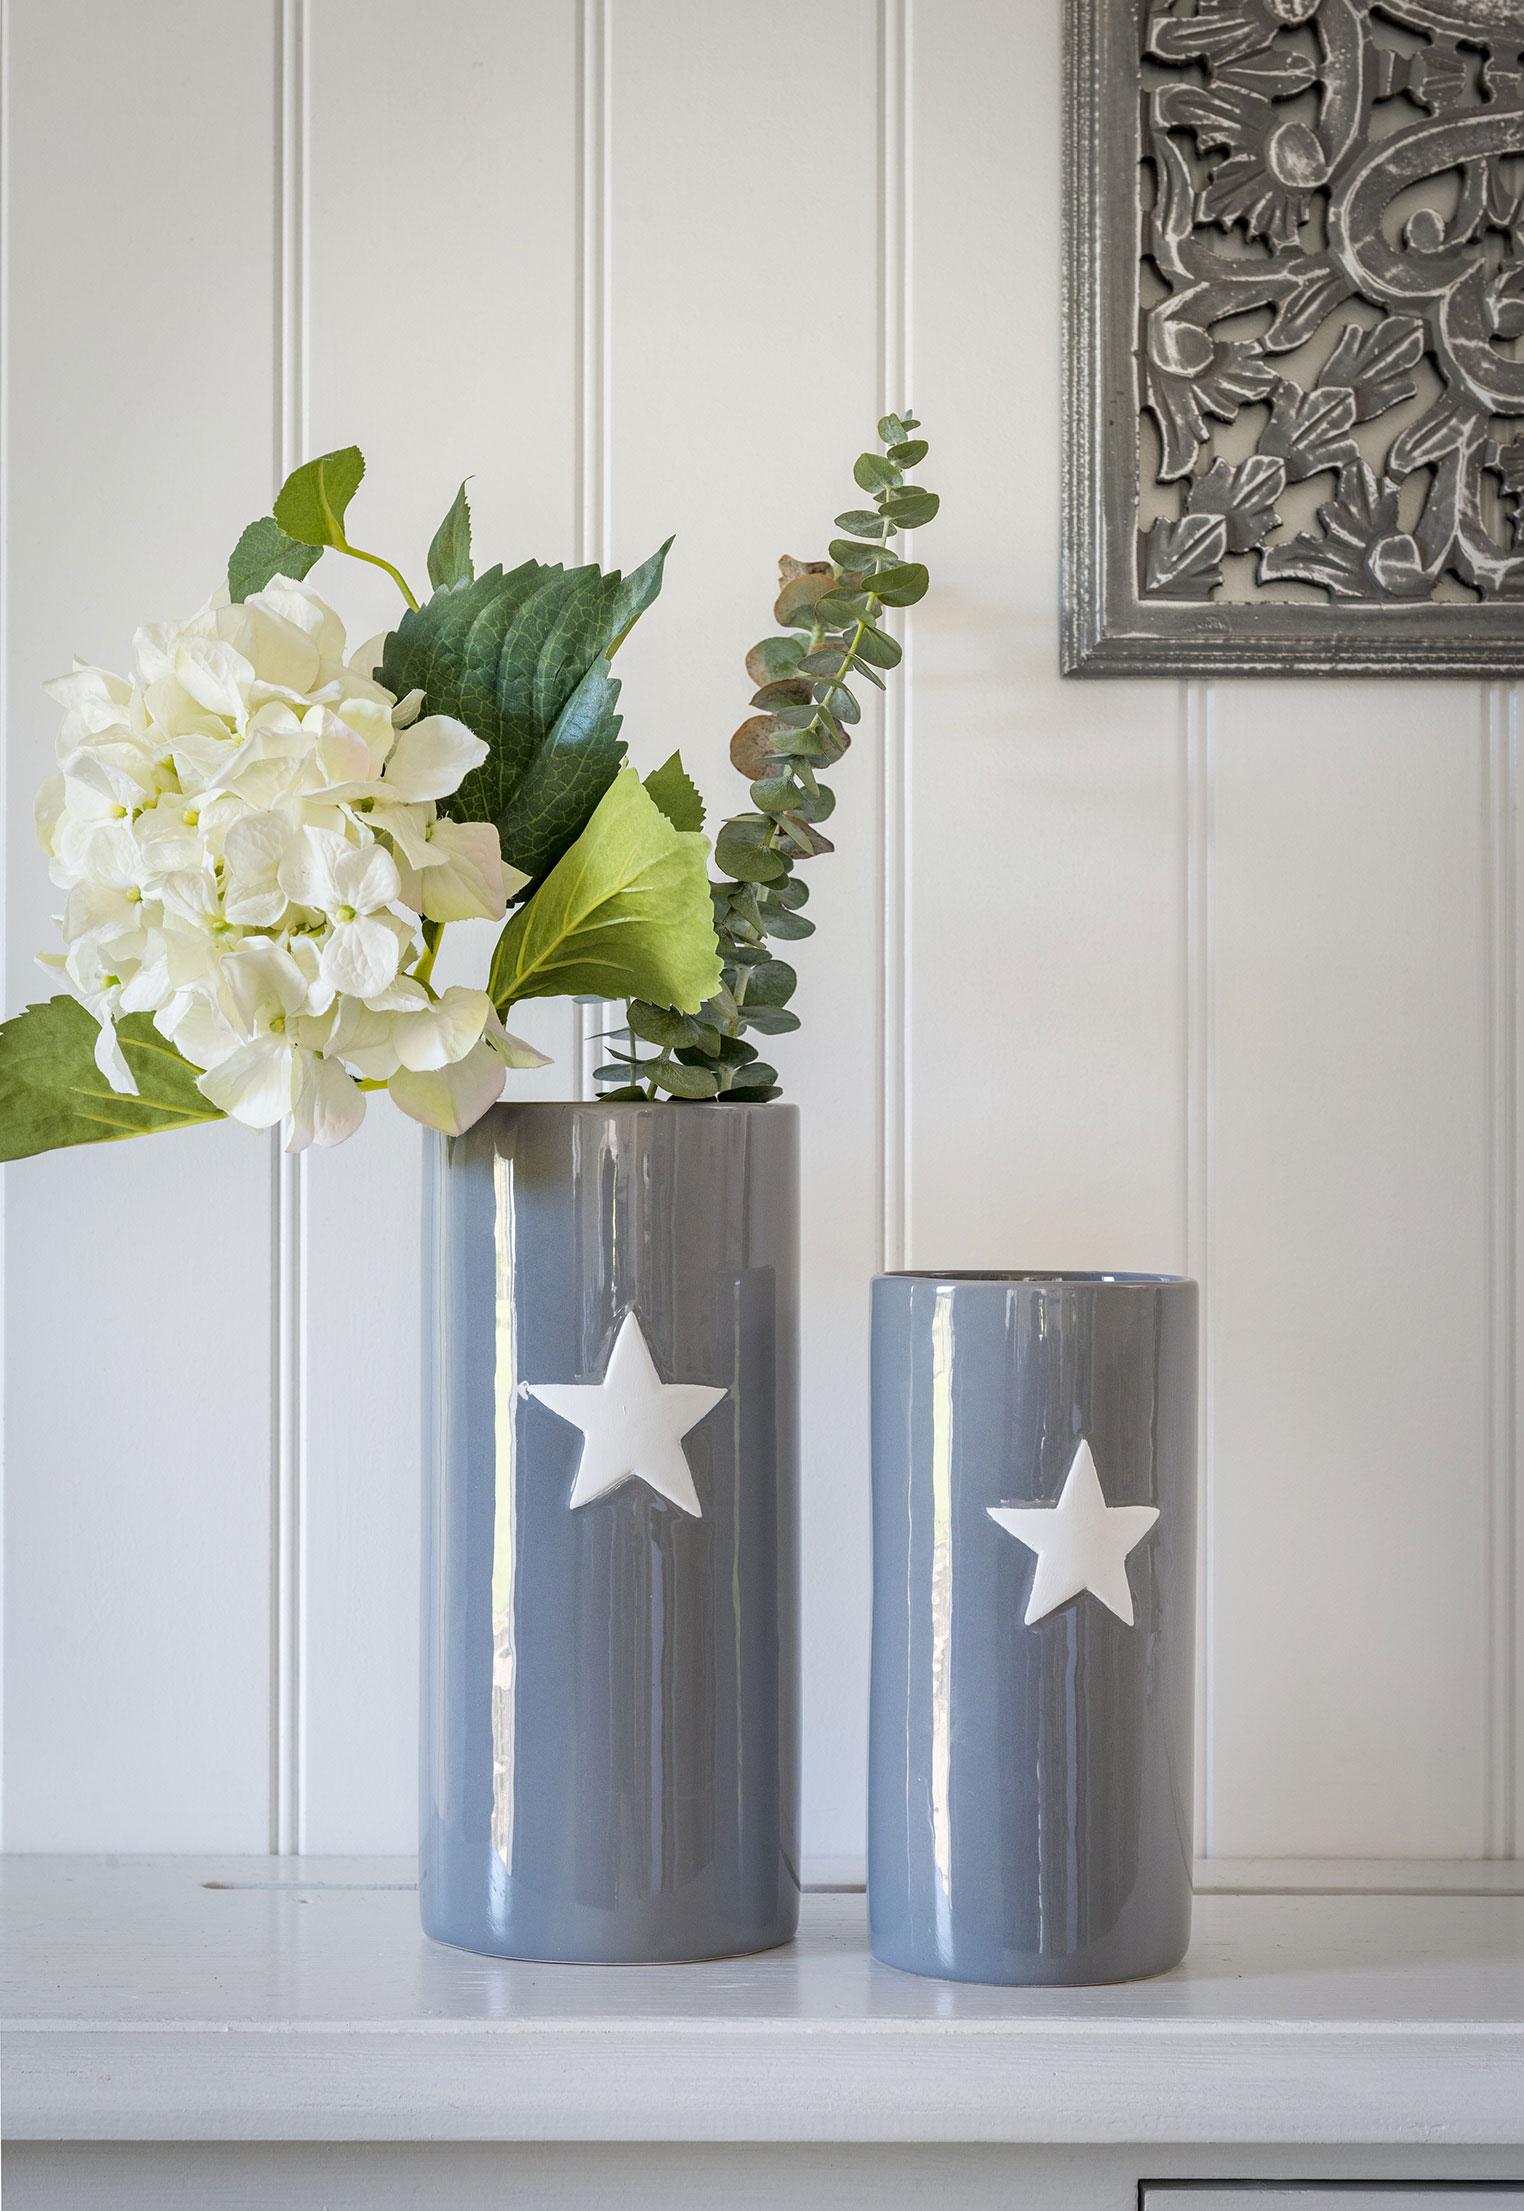 Small Grey Ceramic Star Vase